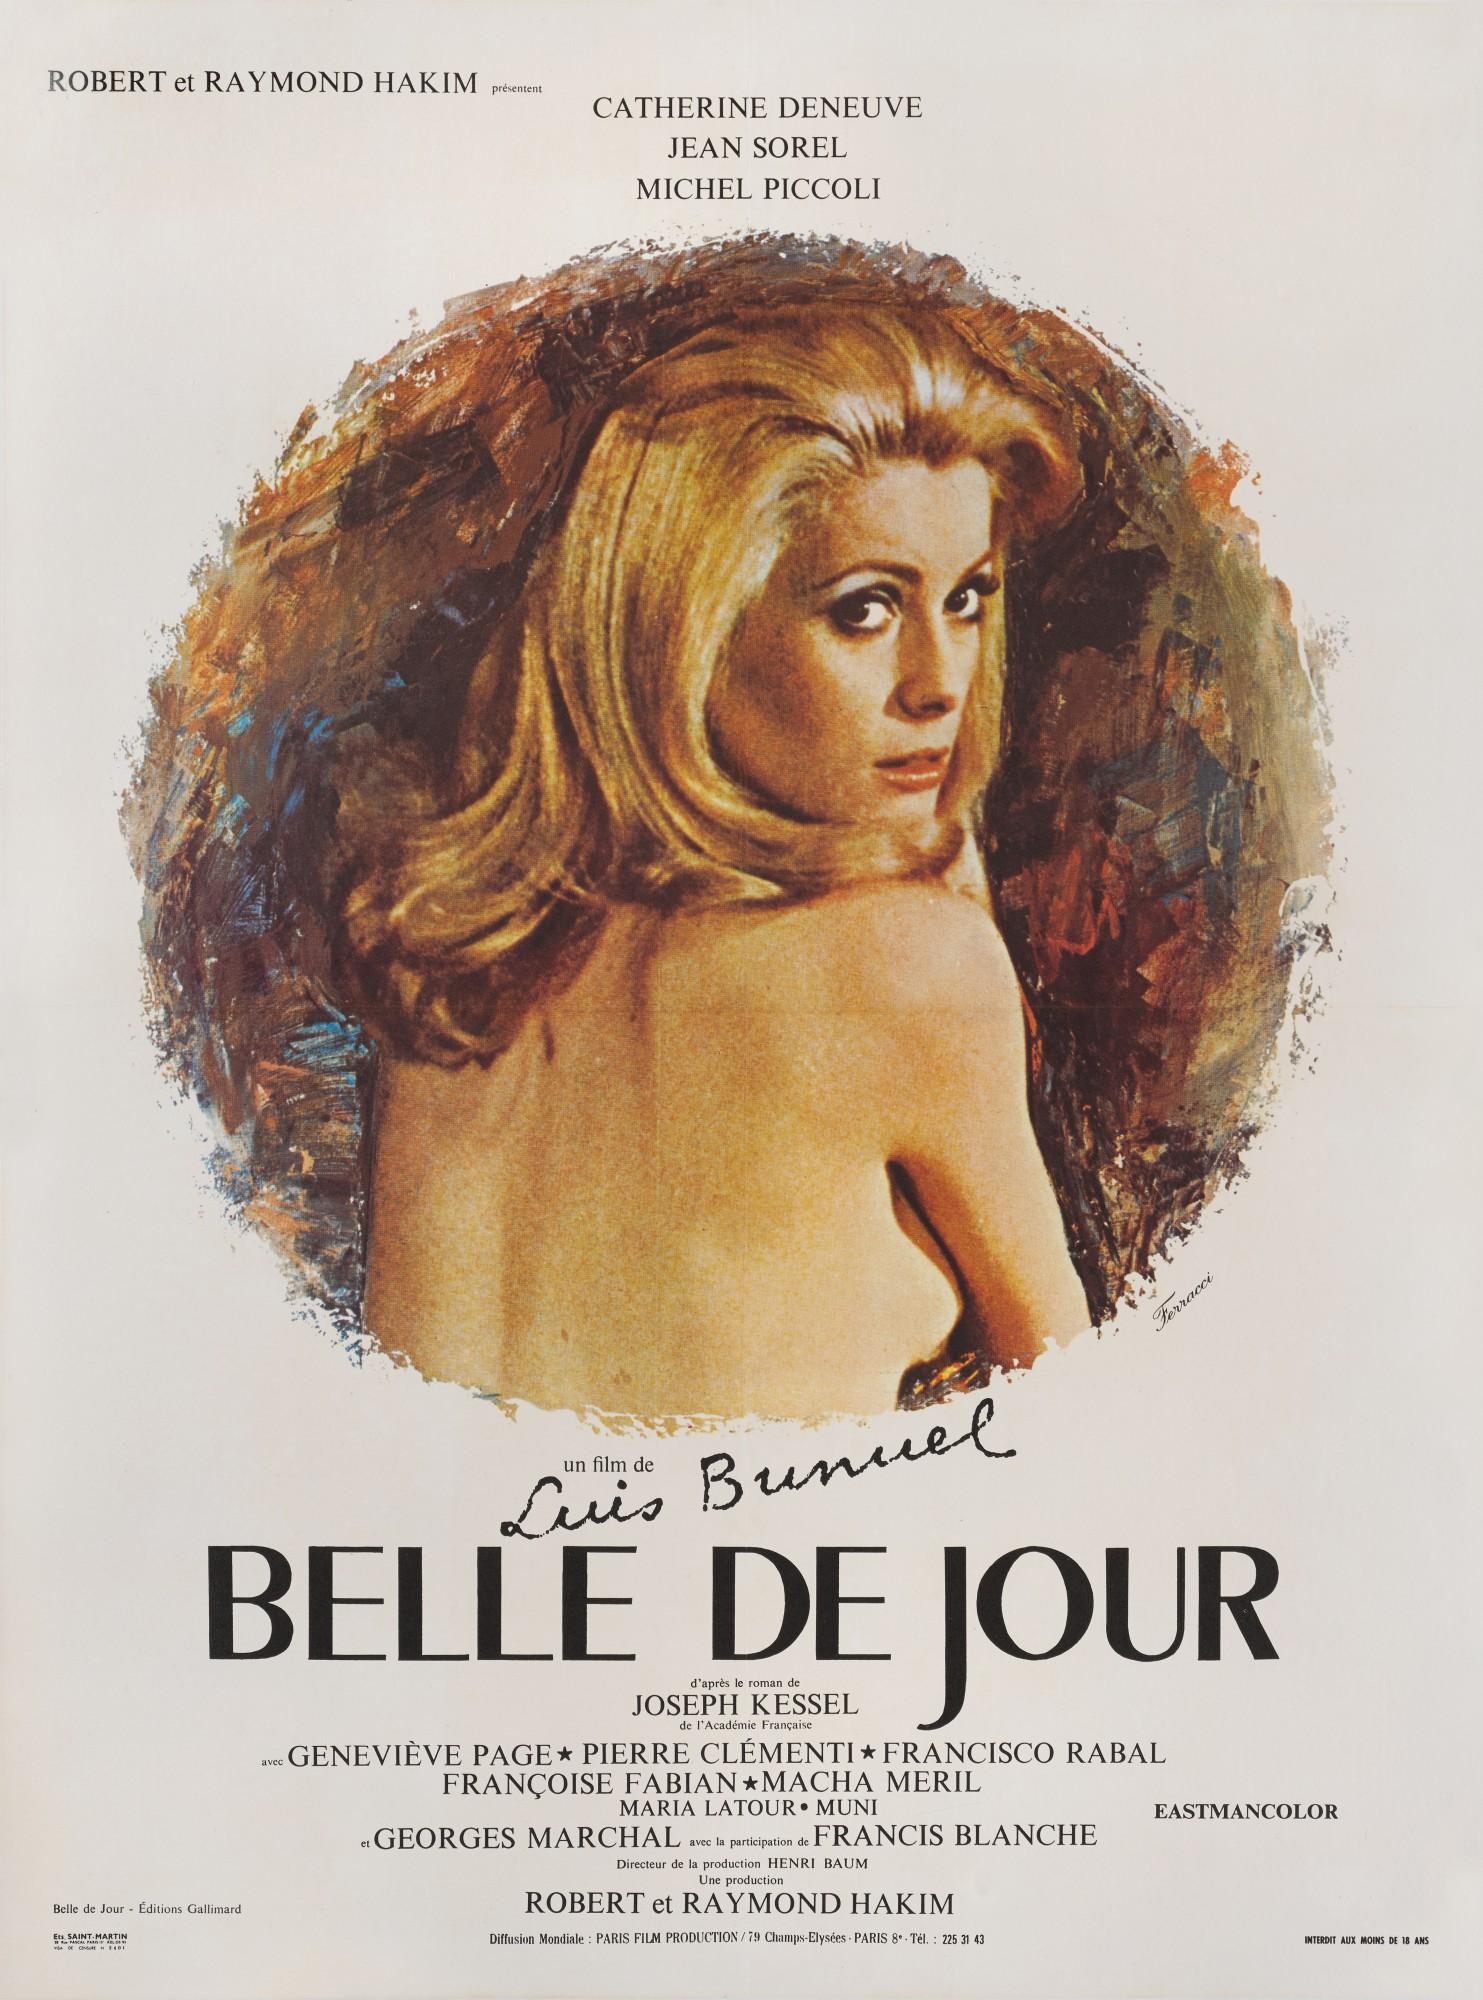 Belle De Jour 1967 Poster French Original Film Posters